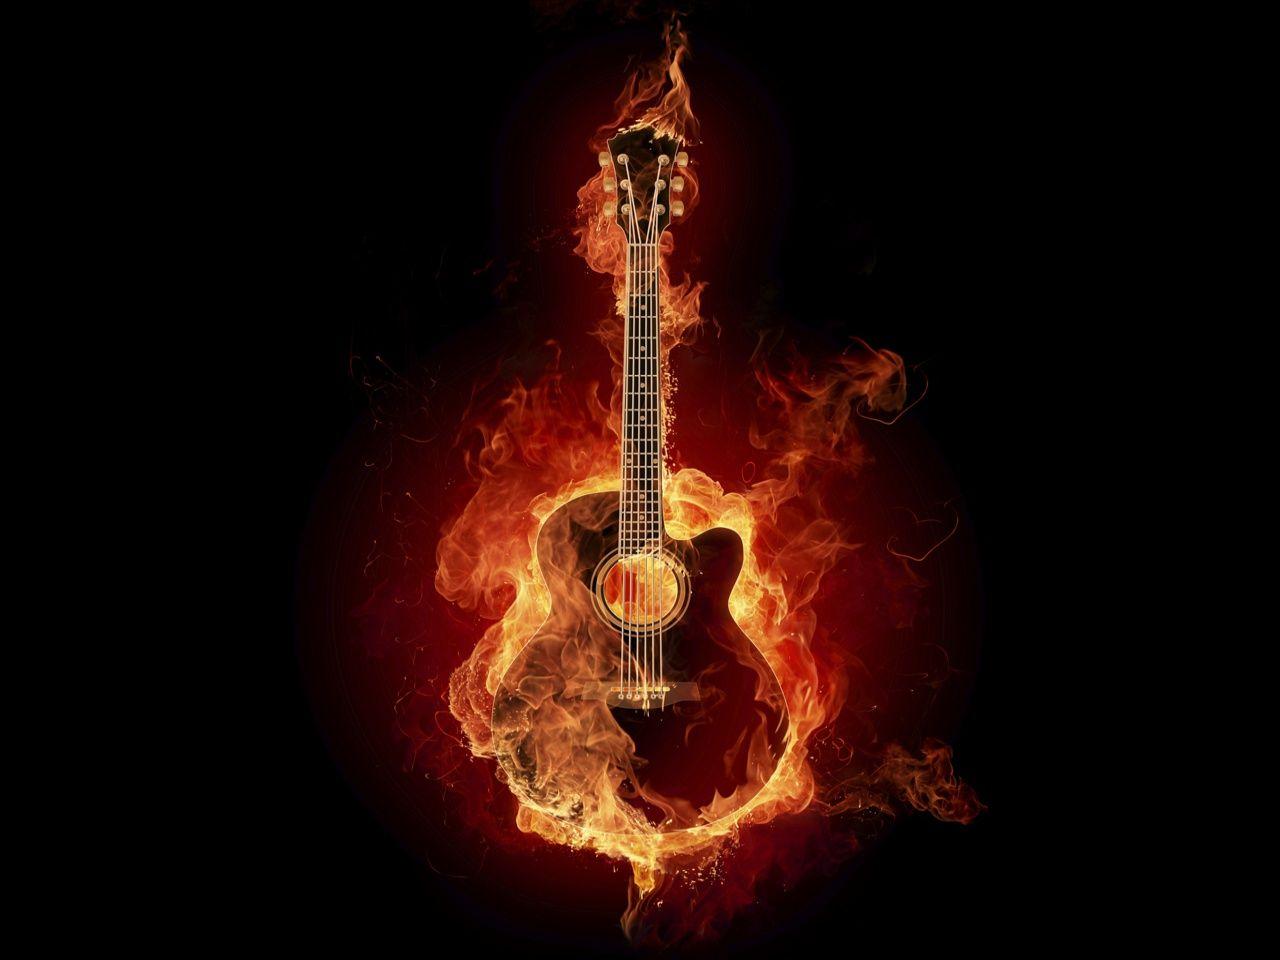 Flames On Fire Fire Flame Guitar Music Wallpaper In 1280x960 Resolution Music Guitar Images Fire Art Music Wallpaper